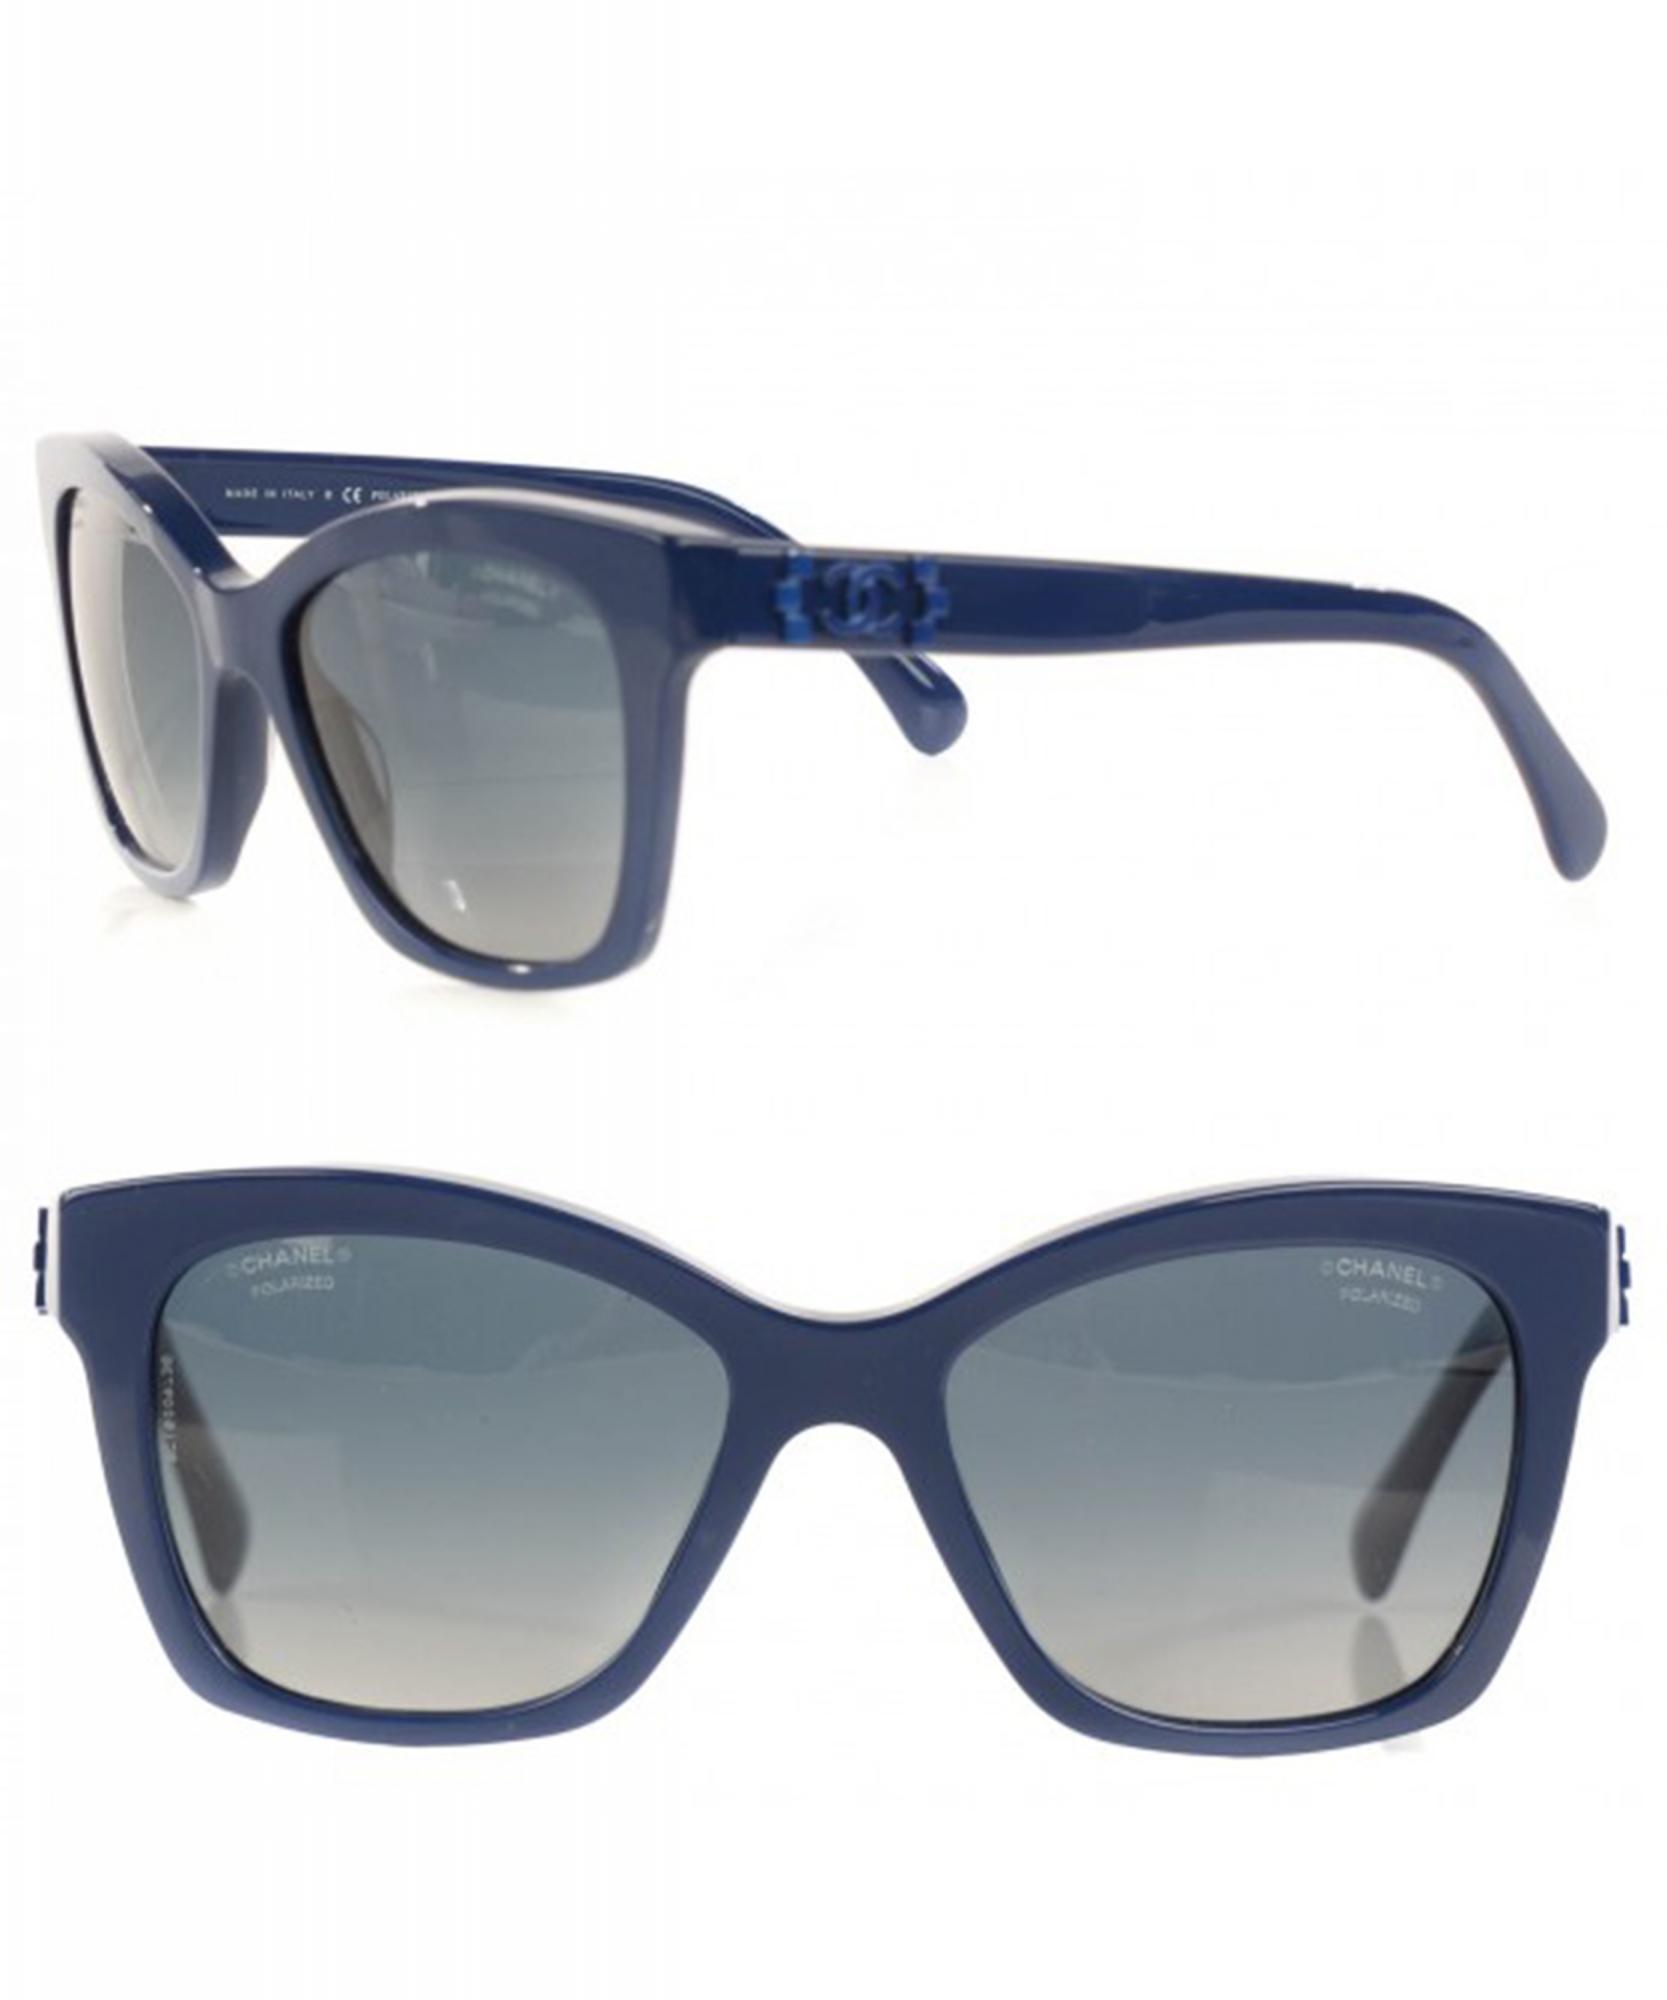 be870c13c3 Chanel Navy Blue Boy Lego 5313 Cc Sunglasses